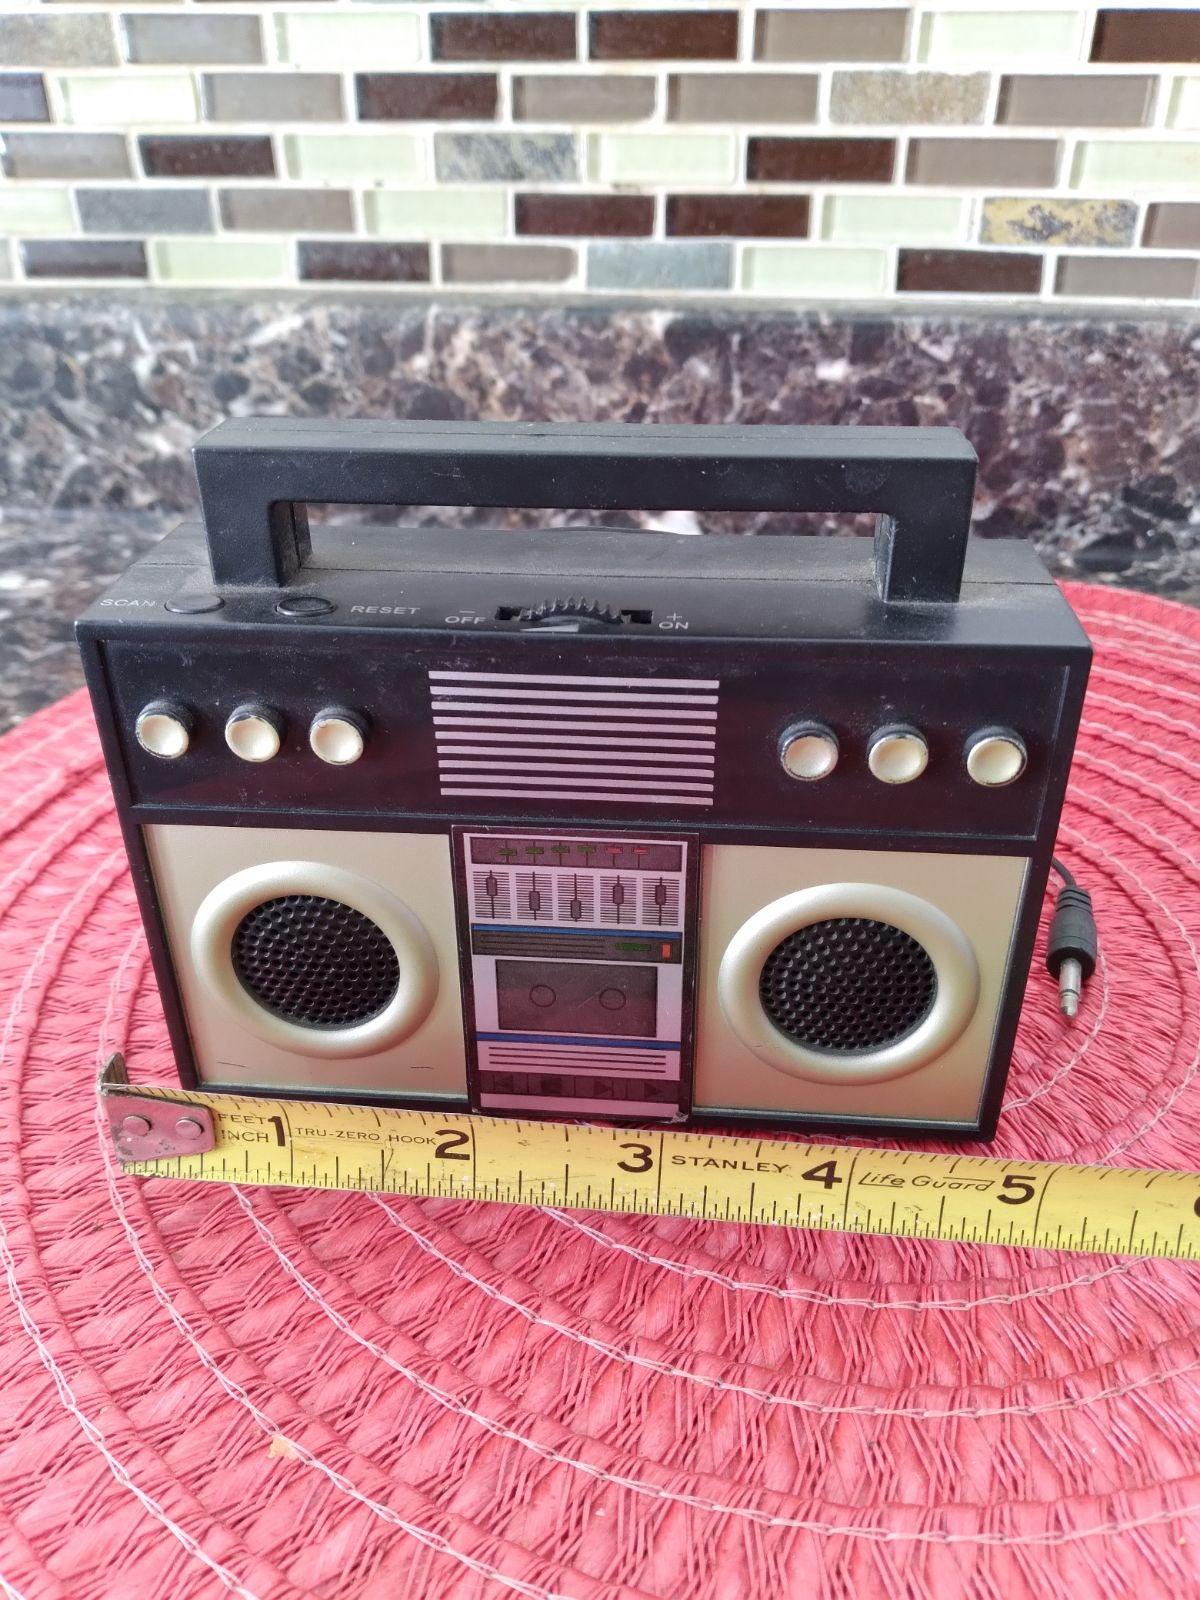 Wired boombox speaker